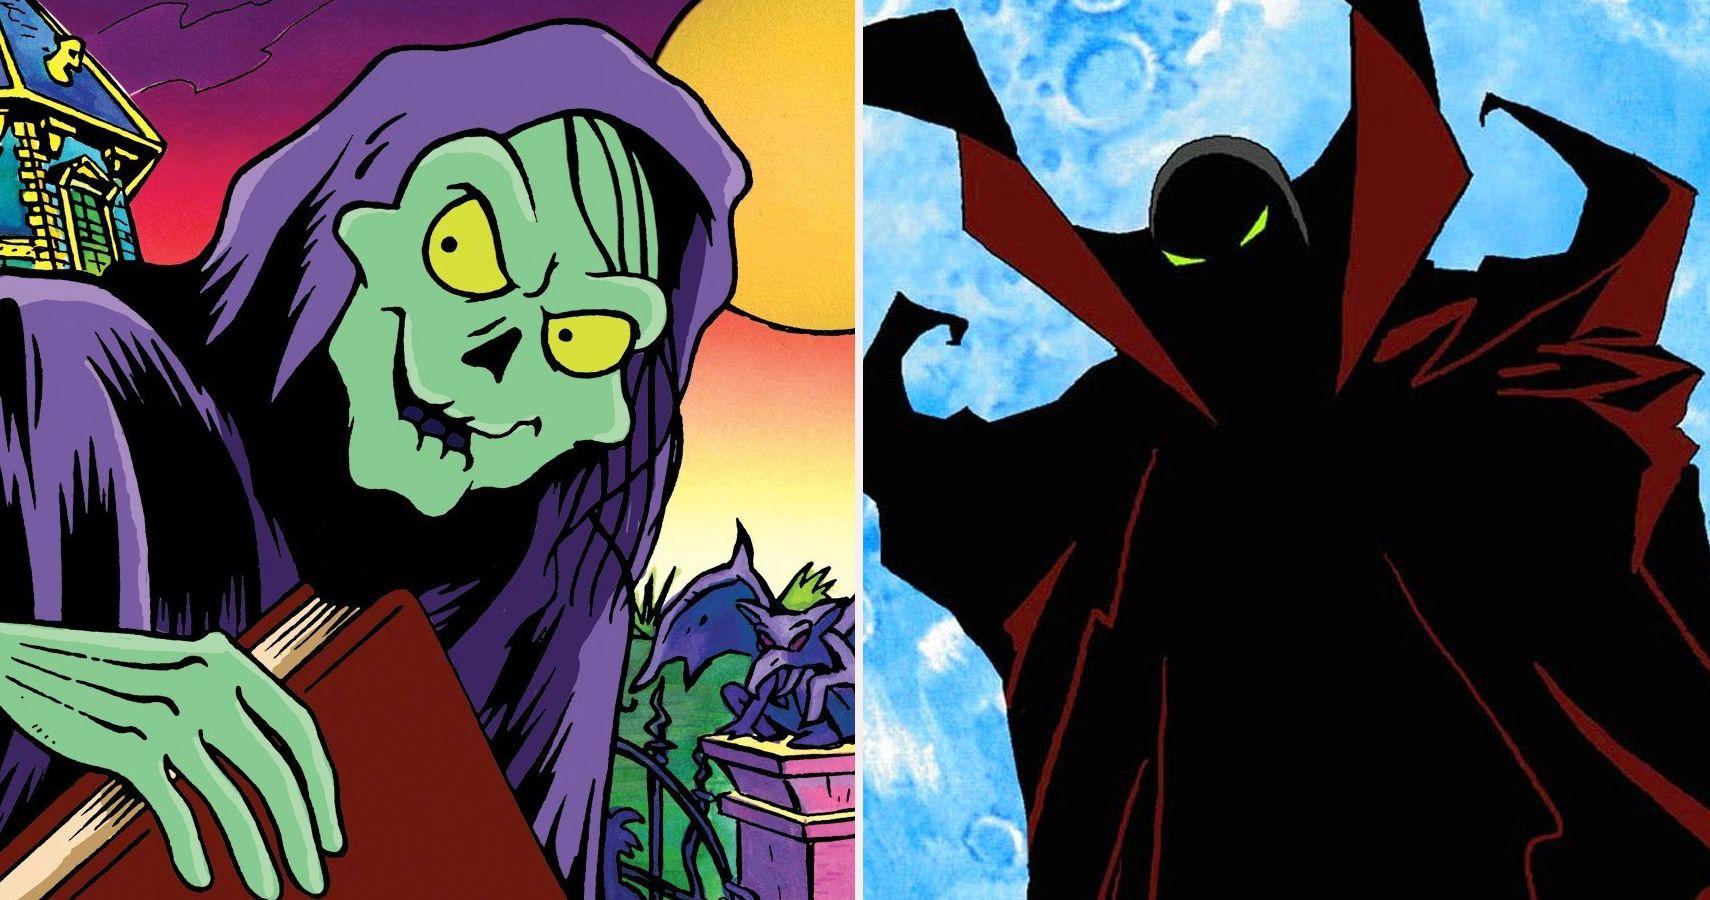 Creepy Cartoons 10 Scariest Animated Horror Series Screenrant